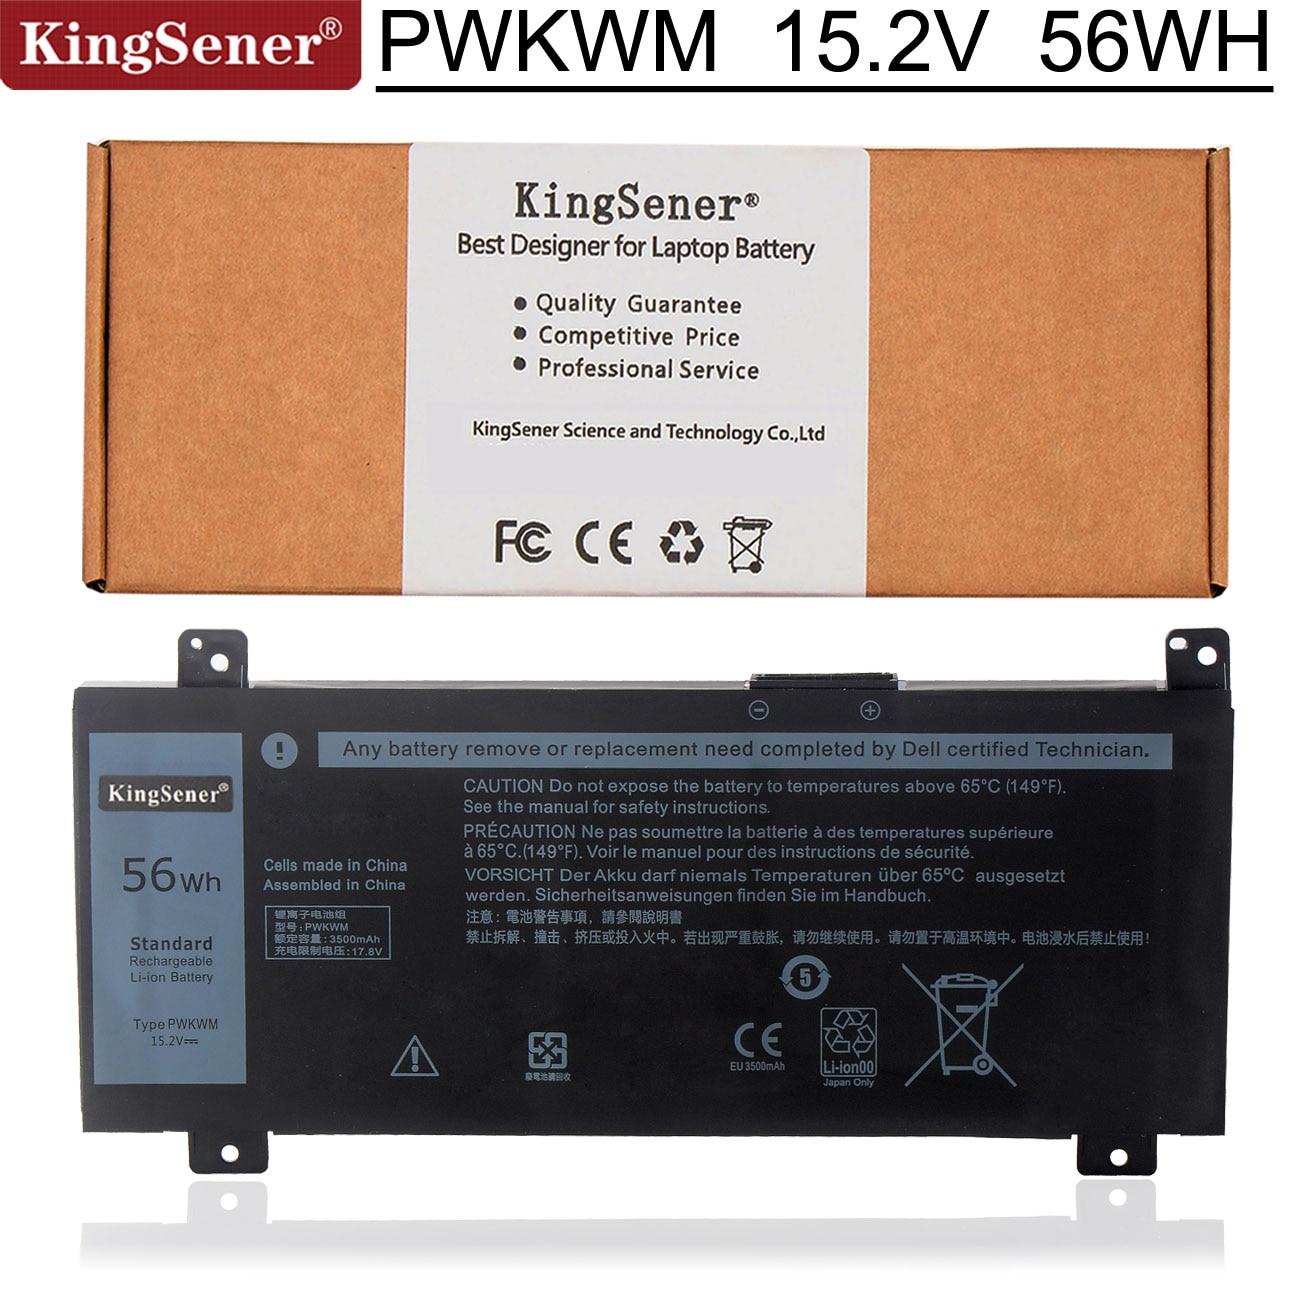 Kingsener PWKWM 15.2V 3500mAh Laptop Battery For DELL Inspiron 14-7466 14-7467 Series PWKWM P78G001